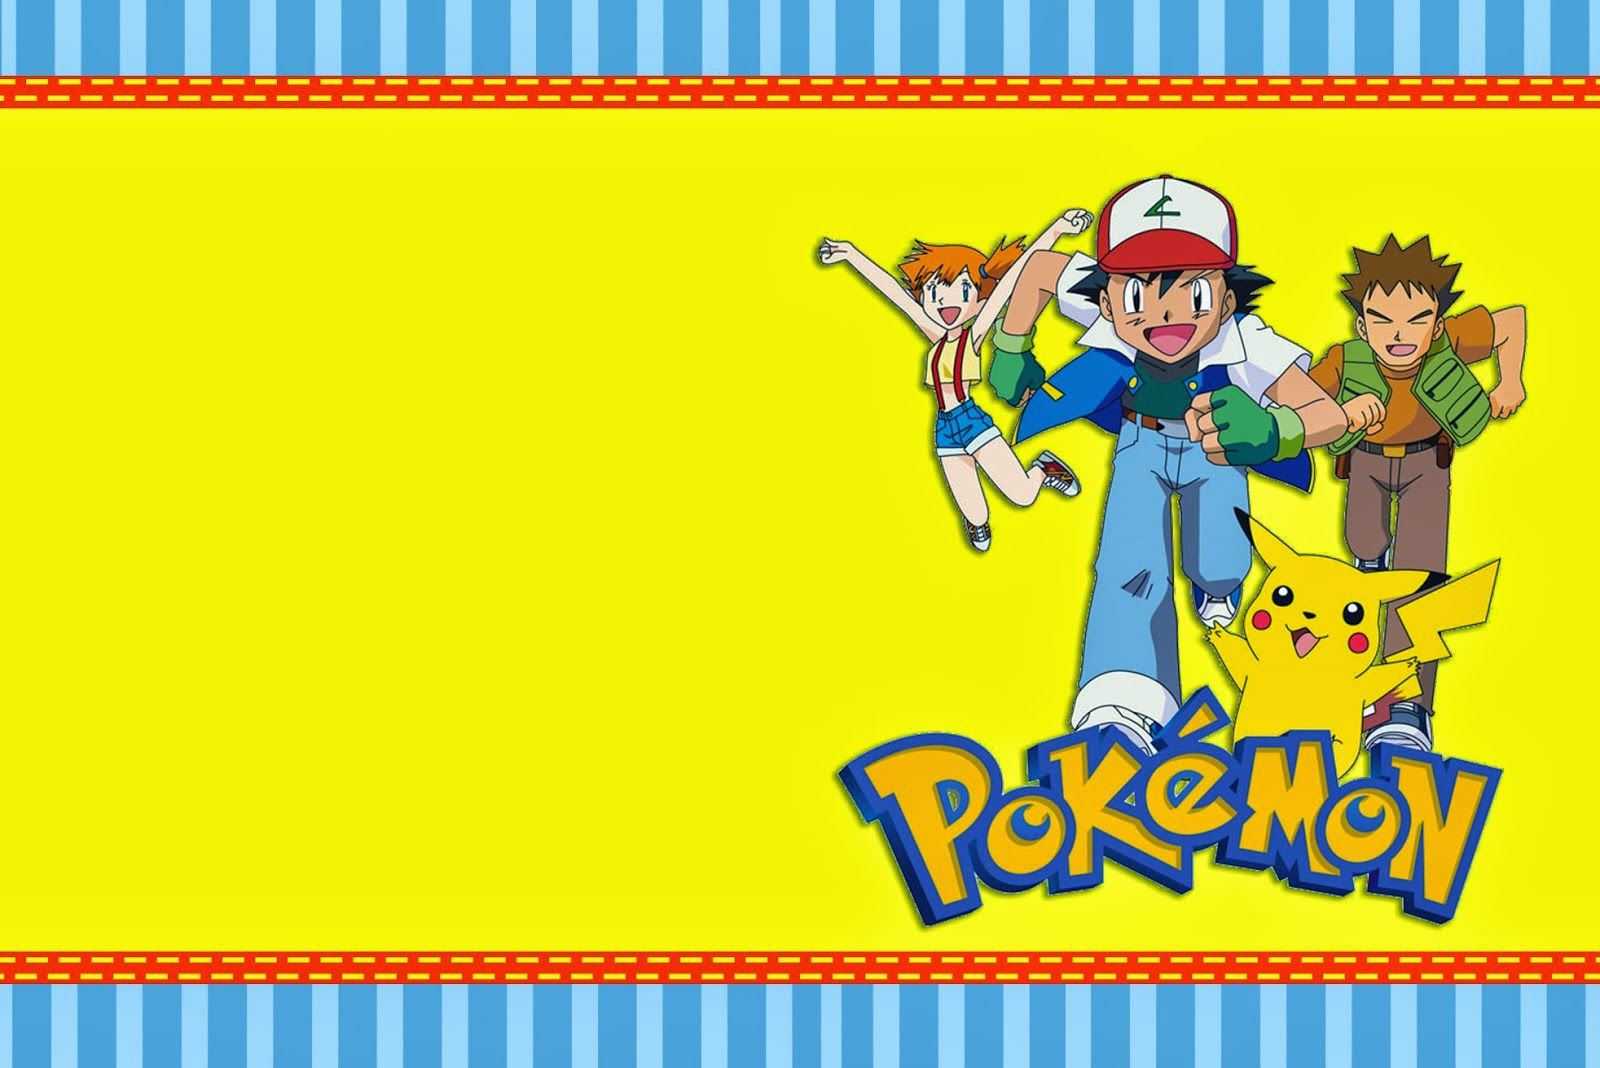 Pokemon Invitaciones Para Imprimir Gratis Birthday Template Free Invitation Templates